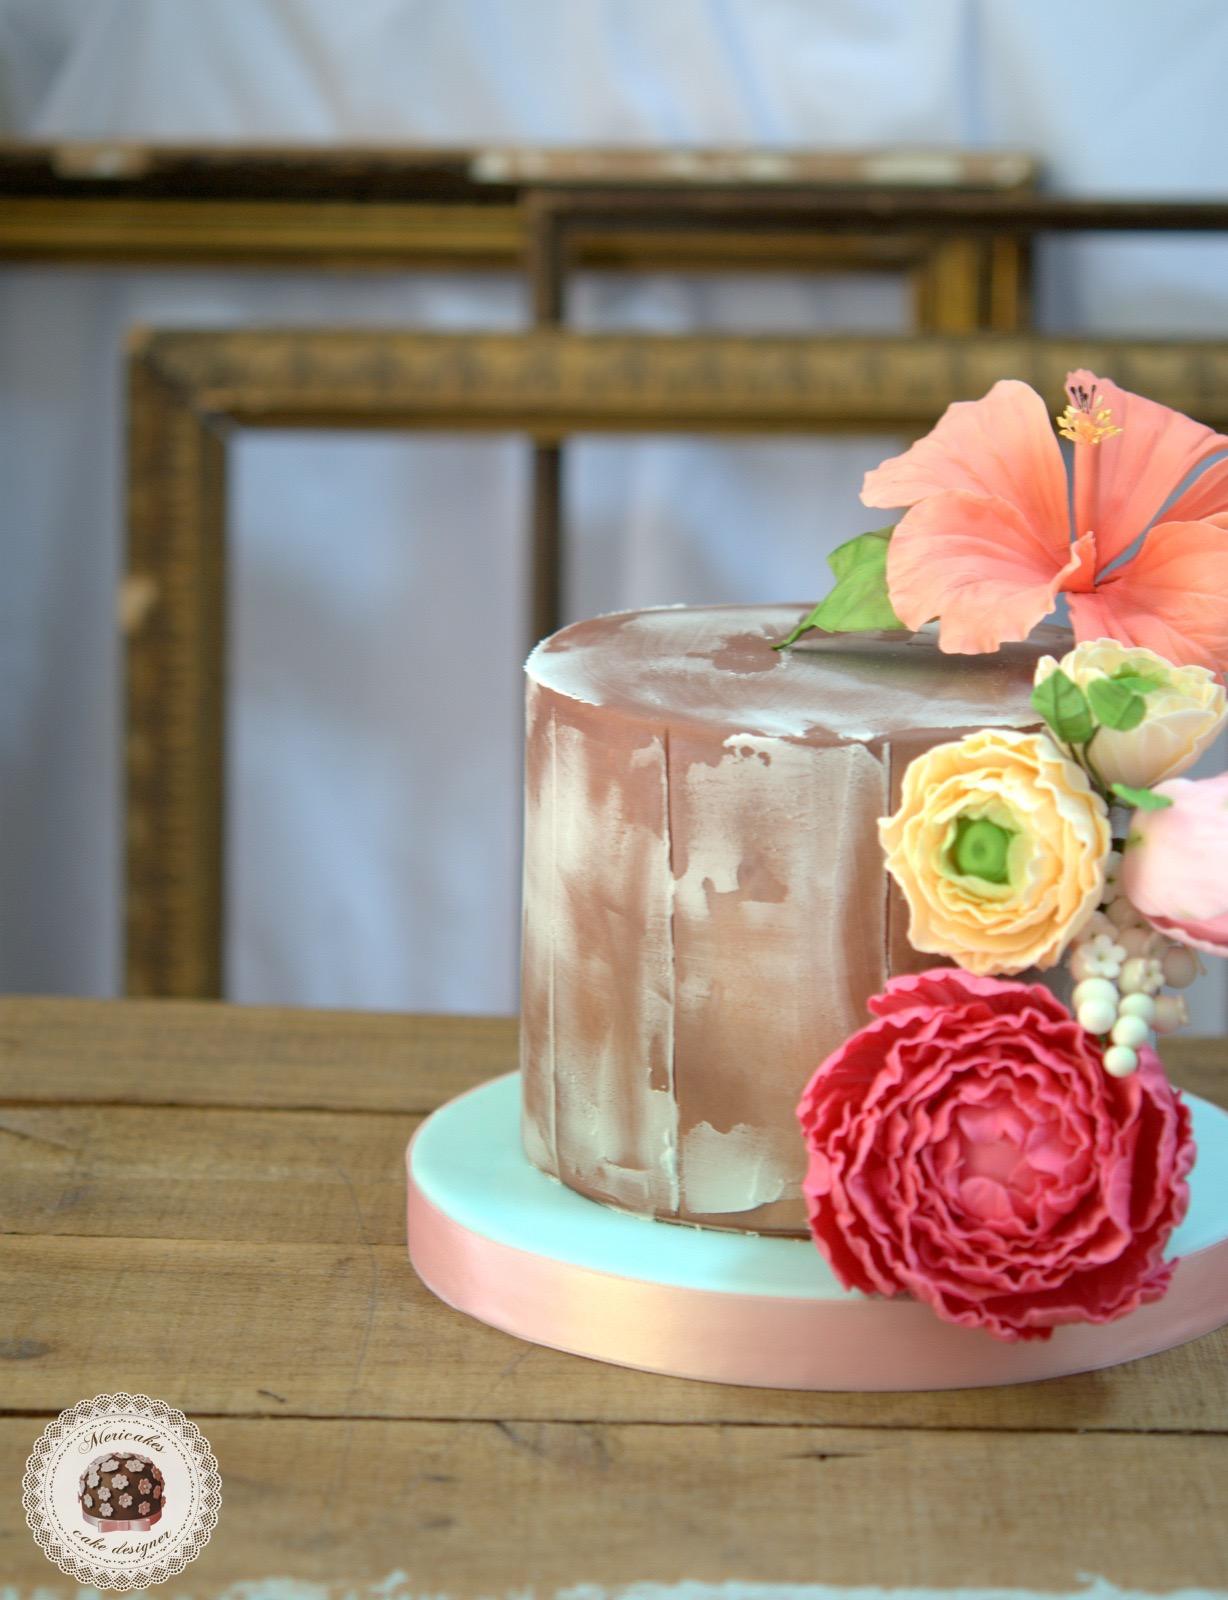 tarta-rustica-cake-cumpleanos-tartas-decoradas-reposteria-creativa-sugarcraft-barcelona-mericakes-flores-de-azucar-sugar-flowers-chocolate-red-velvet